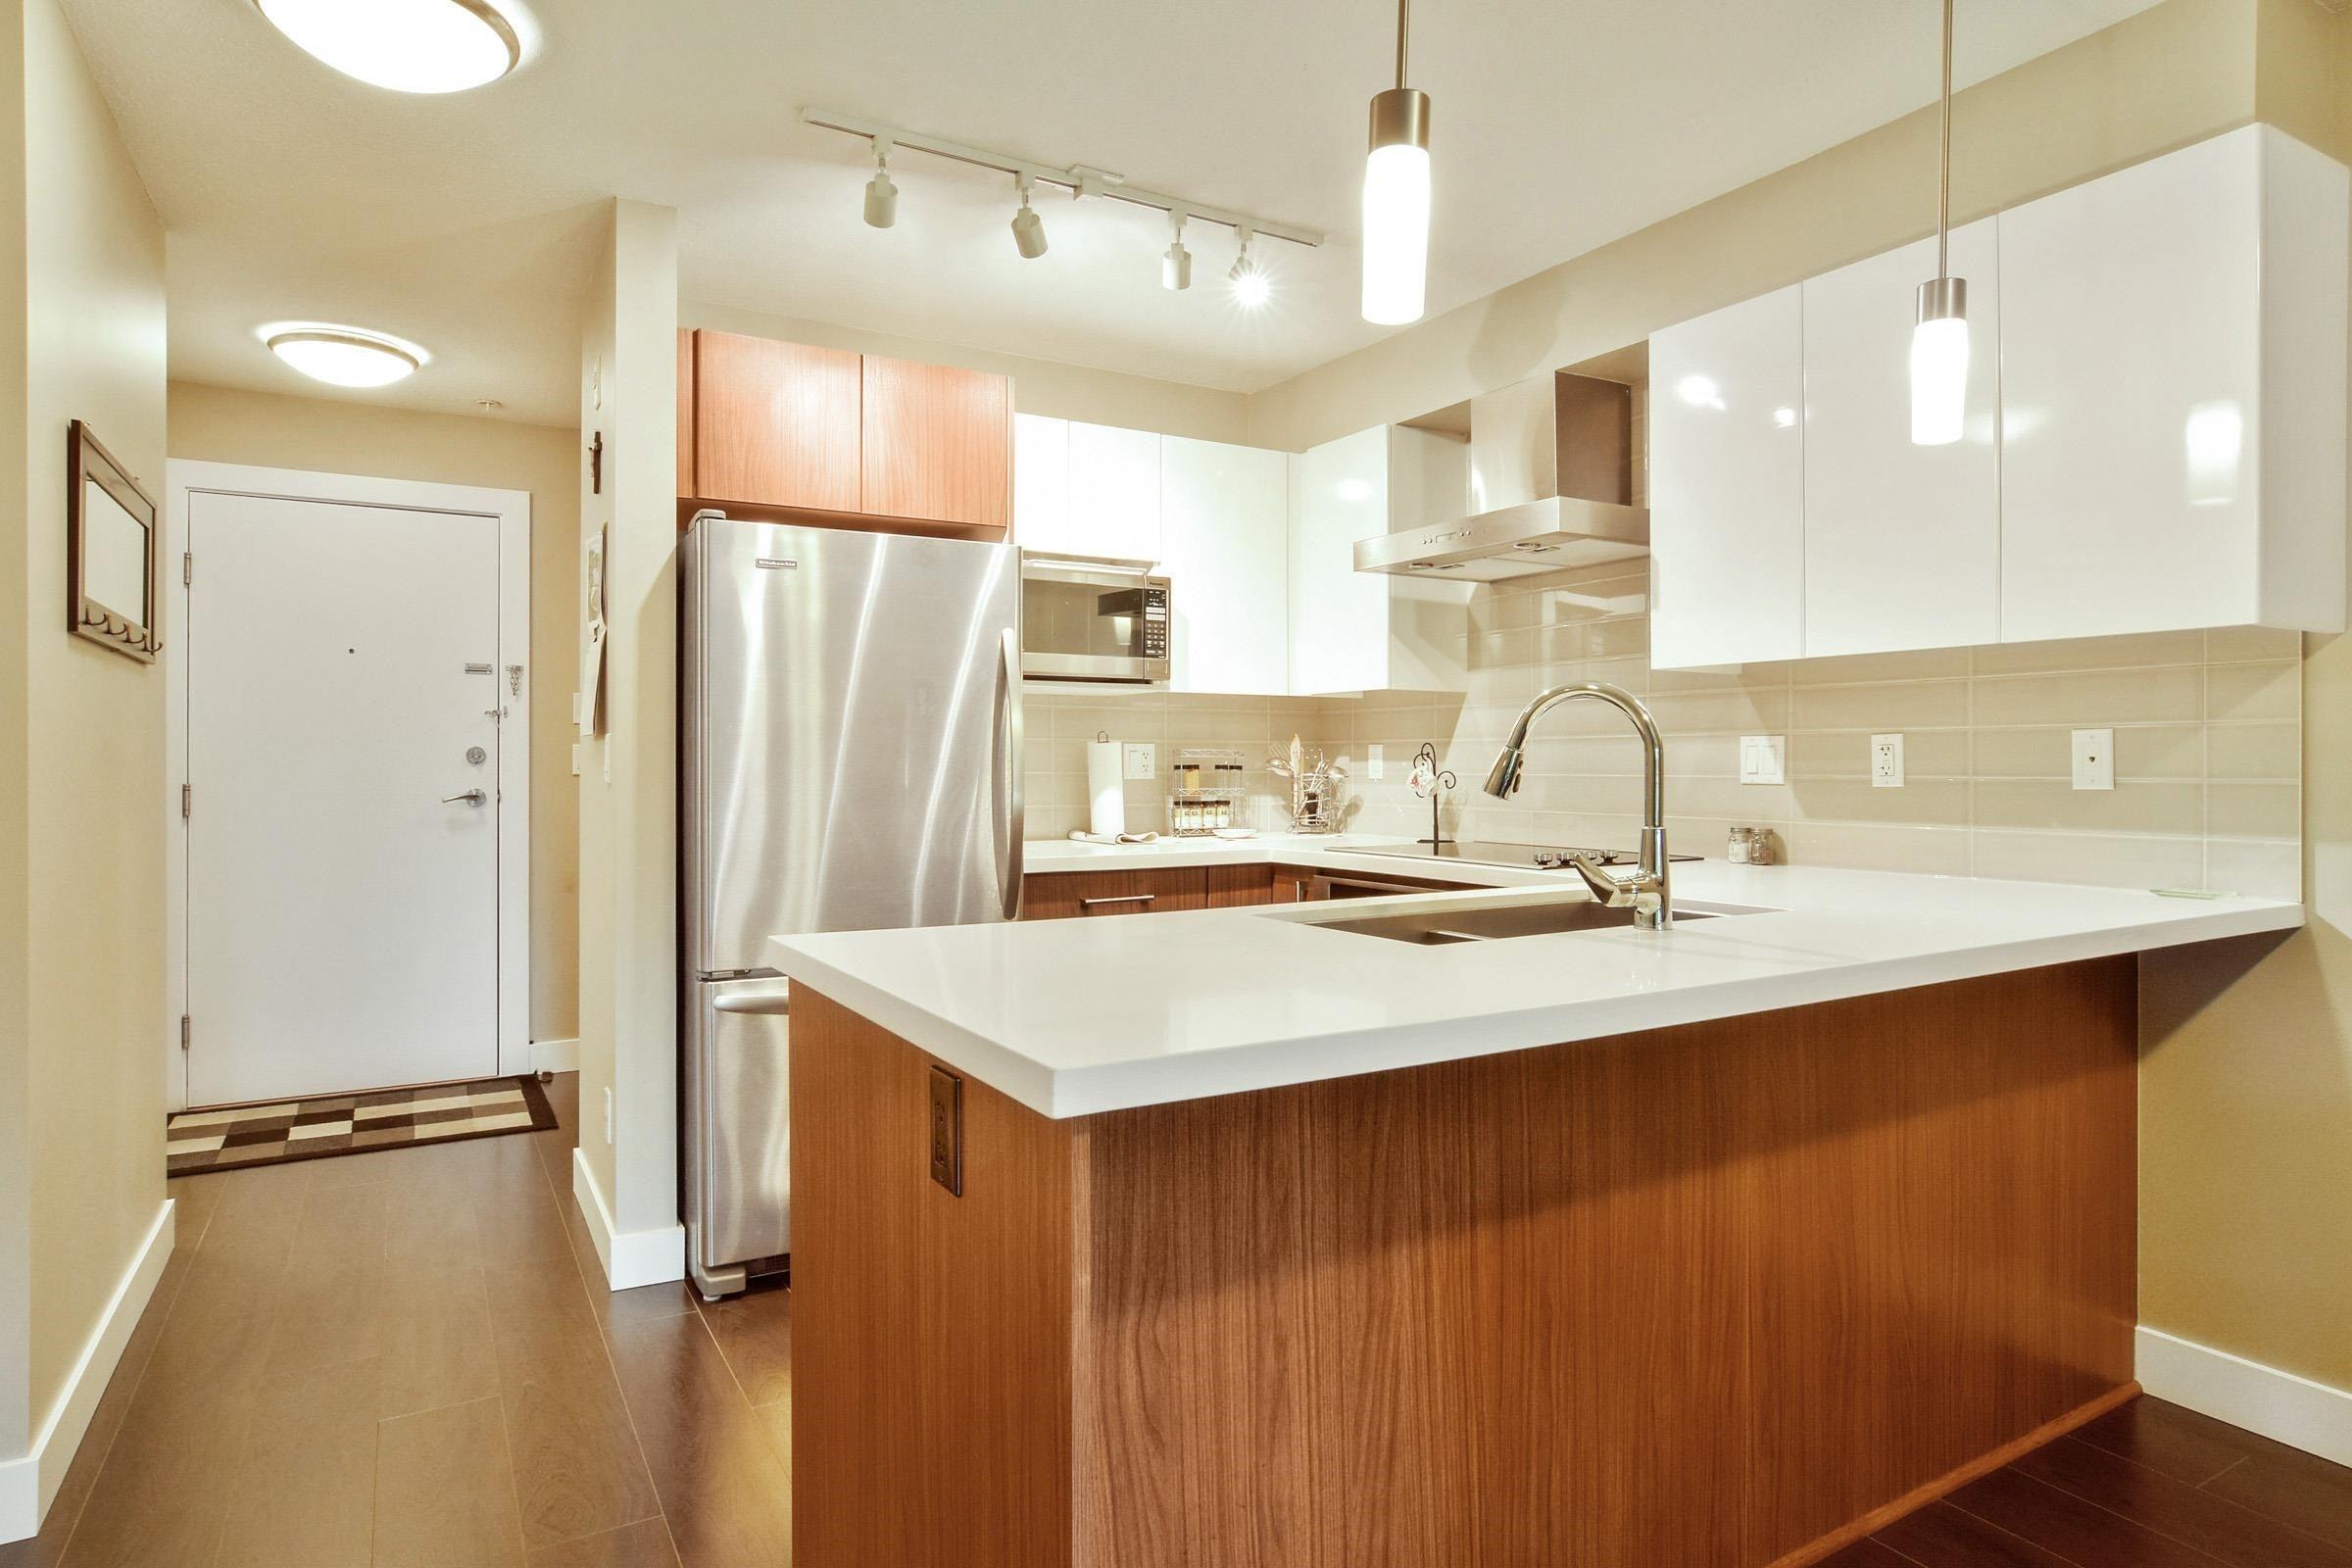 301 7131 STRIDE AVENUE - Edmonds BE Apartment/Condo for sale, 1 Bedroom (R2625669) - #6